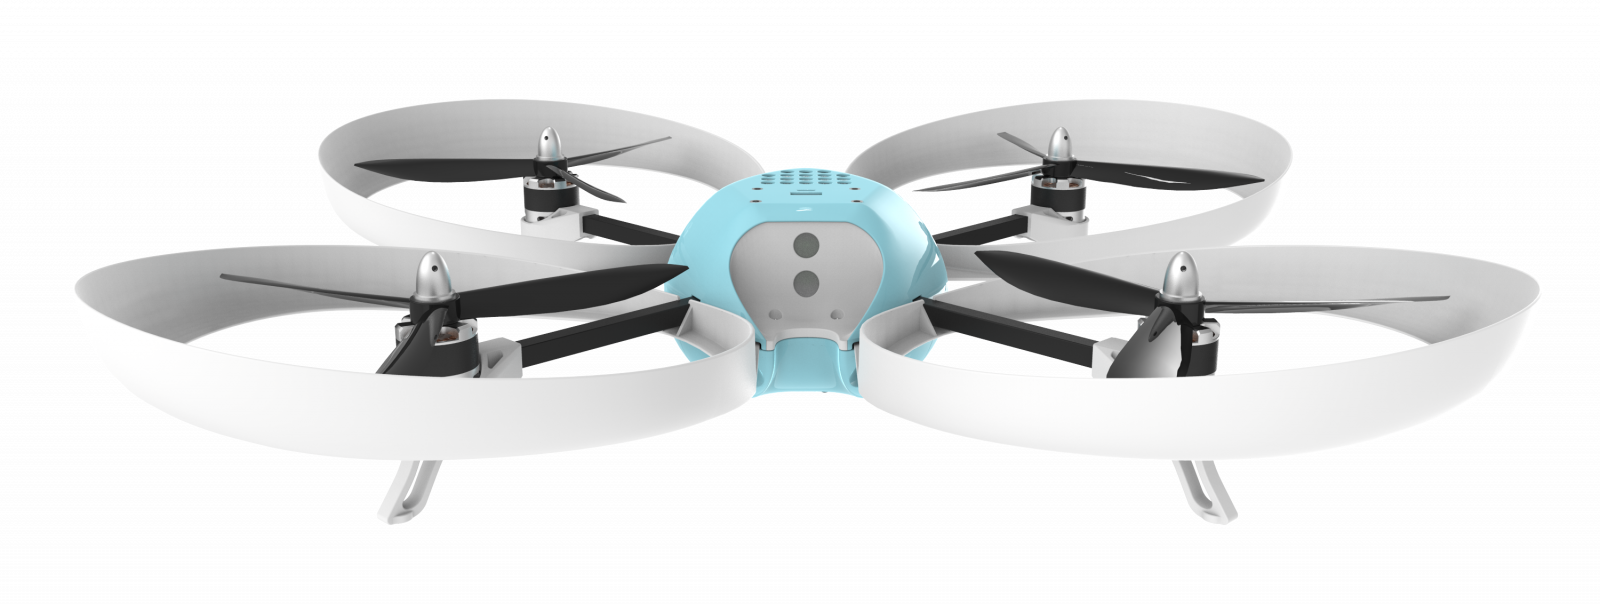 Pleiades' Spiri drone. Photo by Pleiades